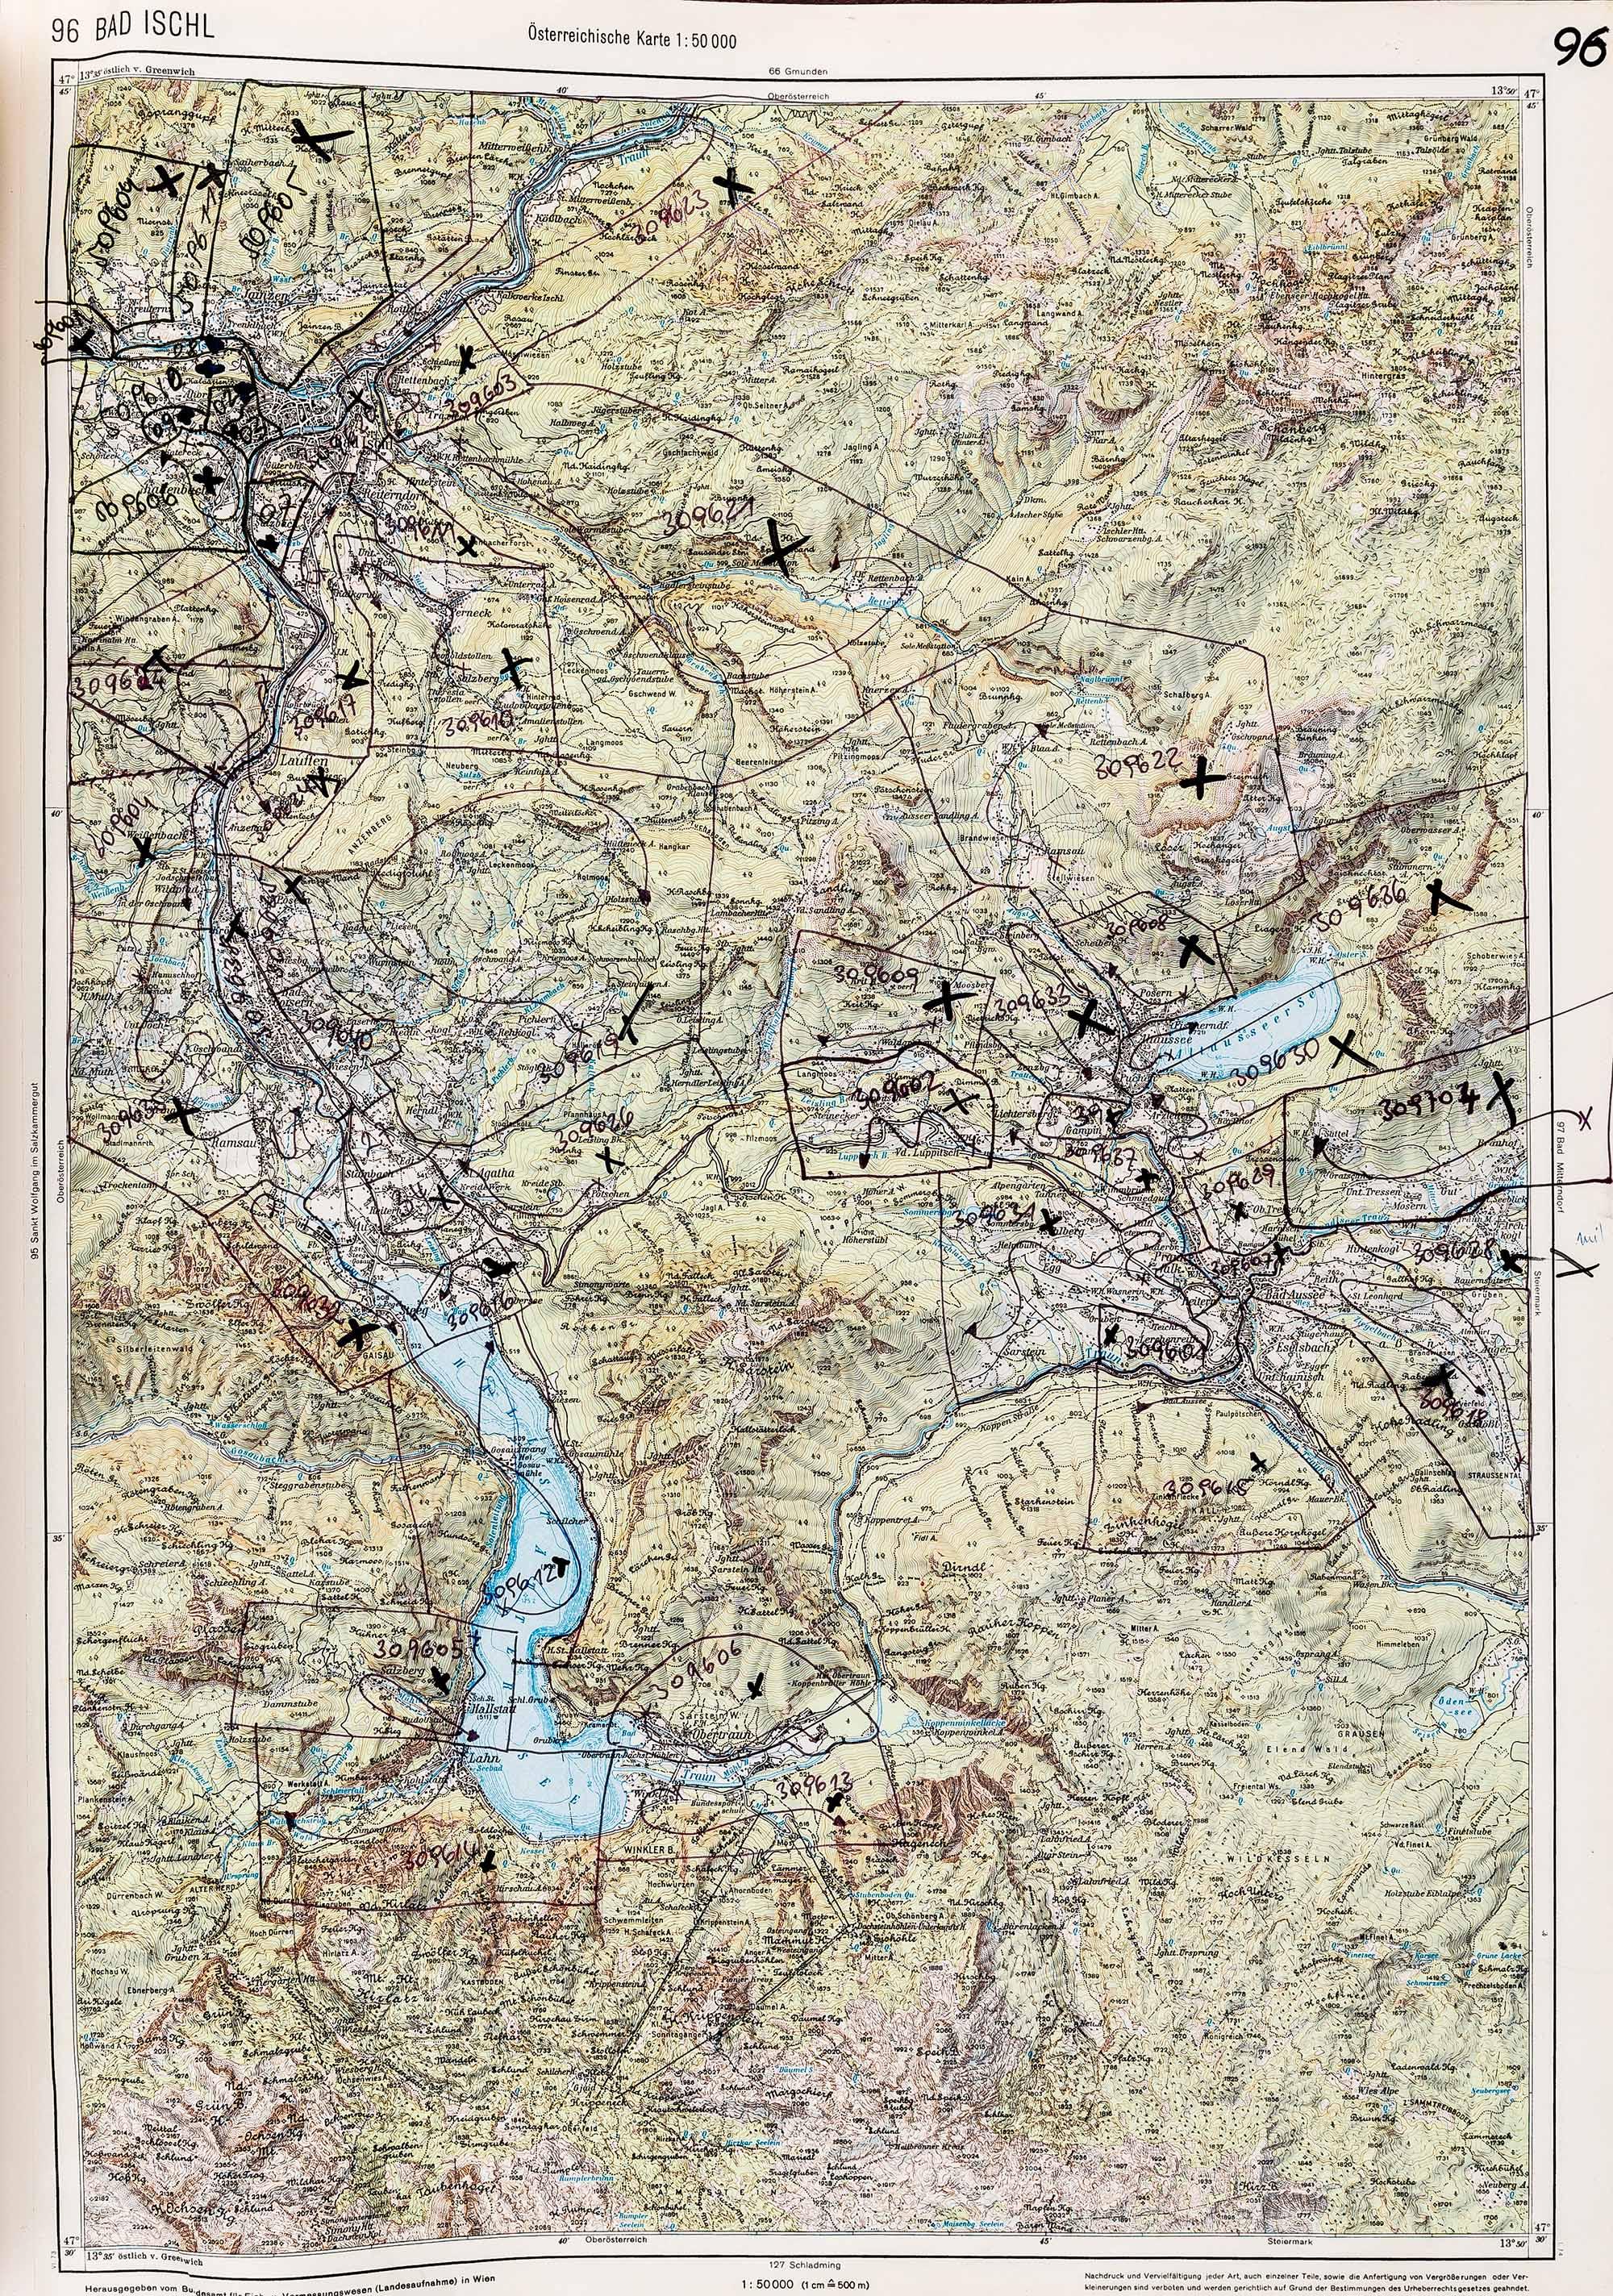 1983-1986 Karte 096